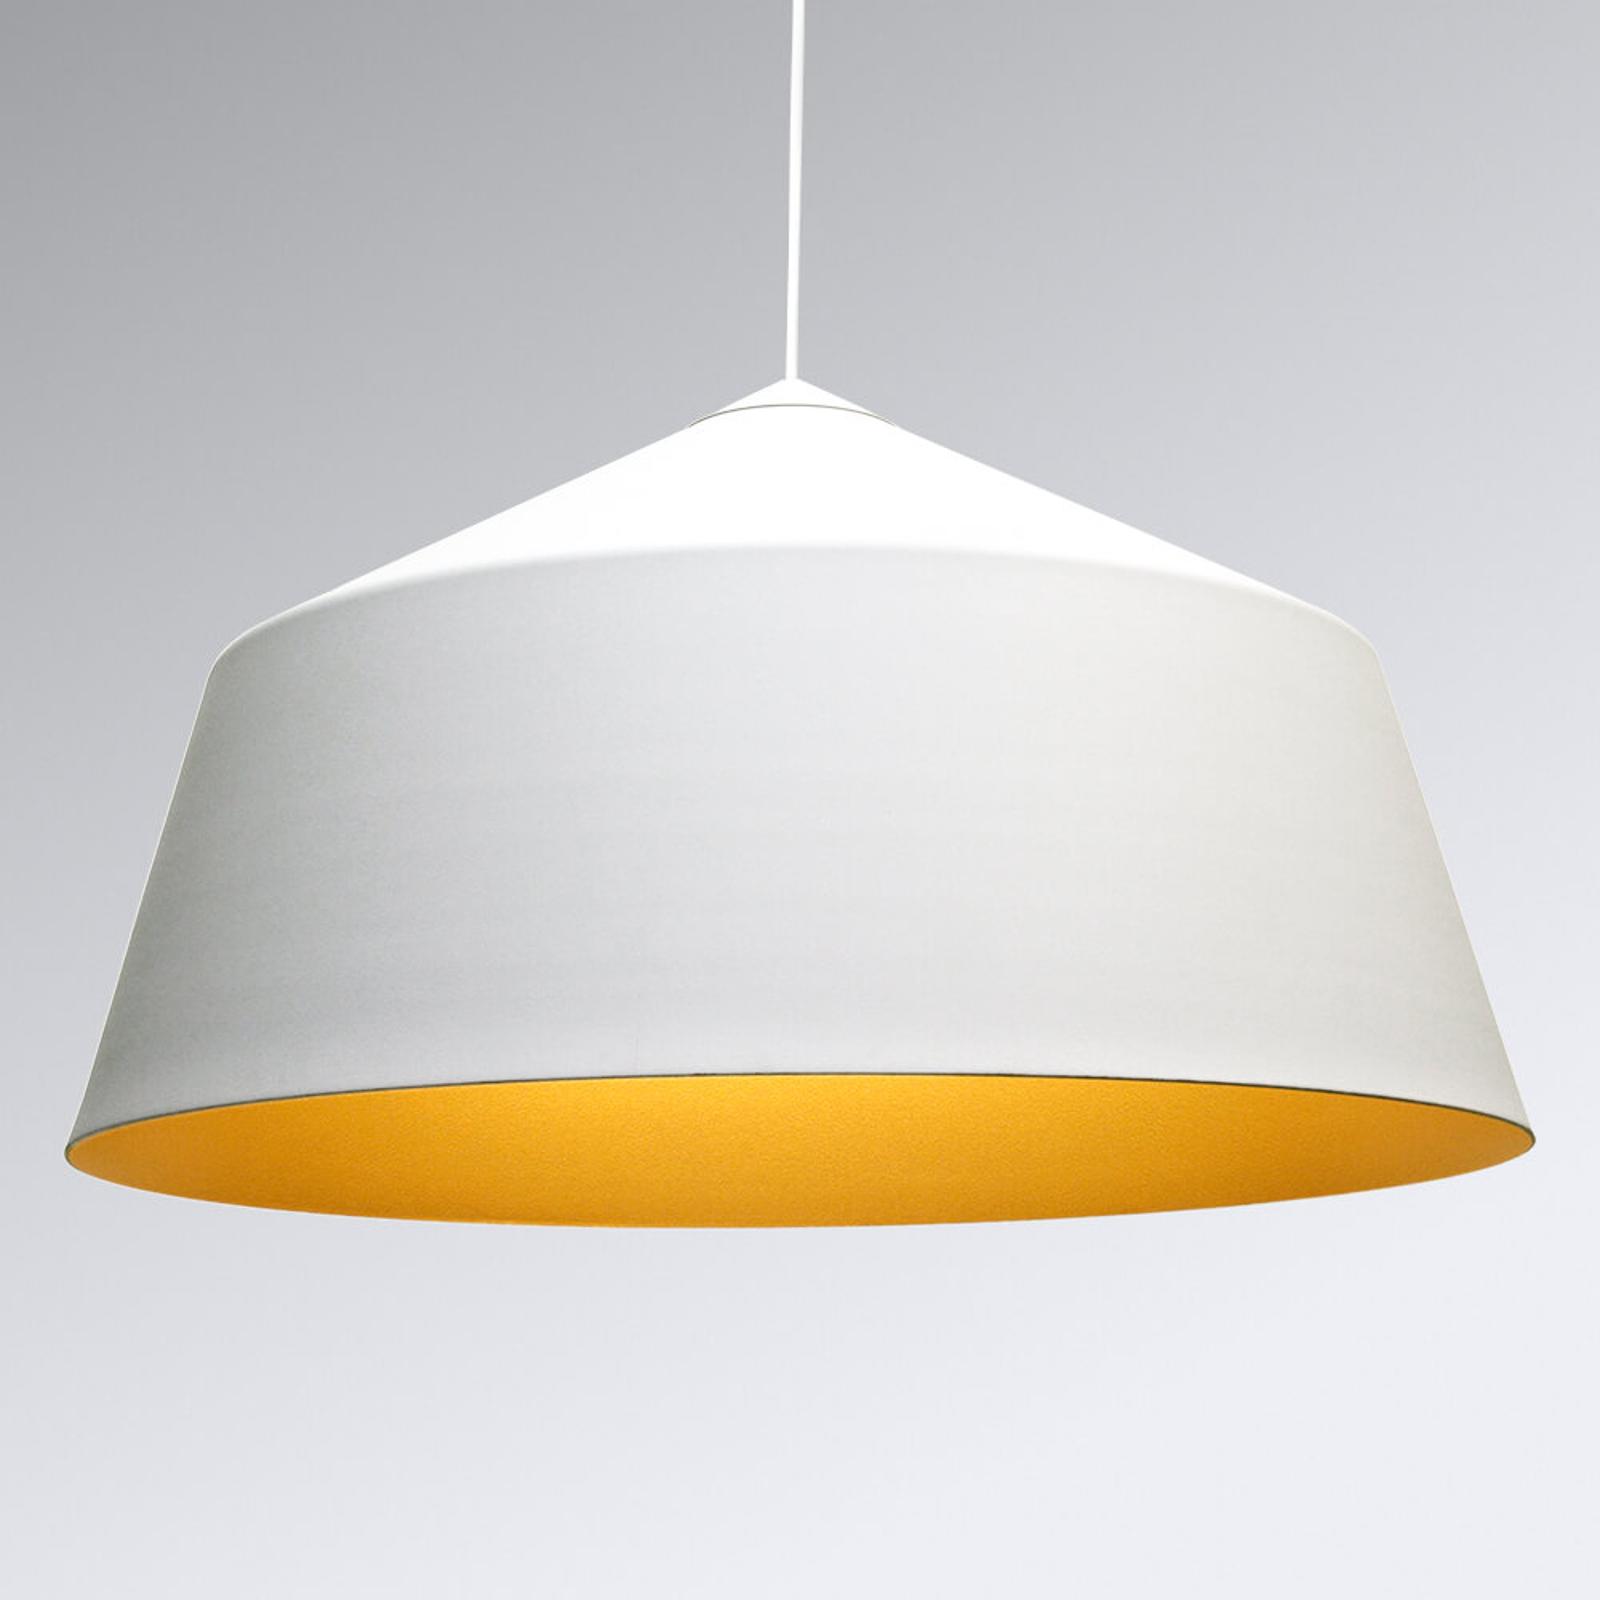 Innermost Circus - hængelampe, hvid-gylden, 56 cm